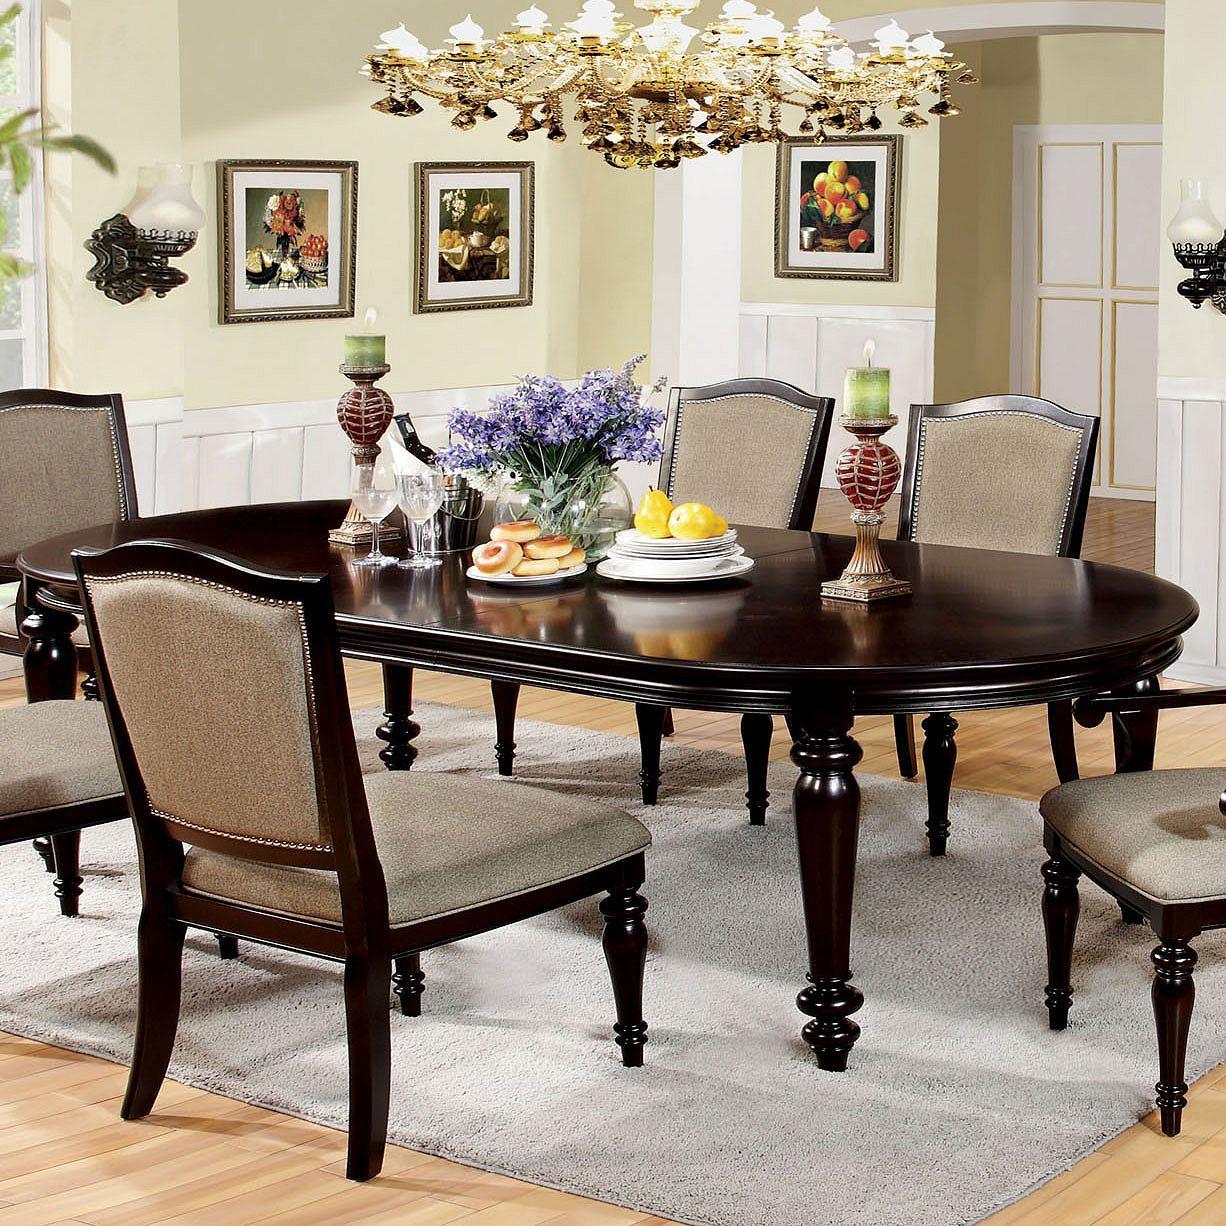 457 790 Furniture of America 98 Barrington